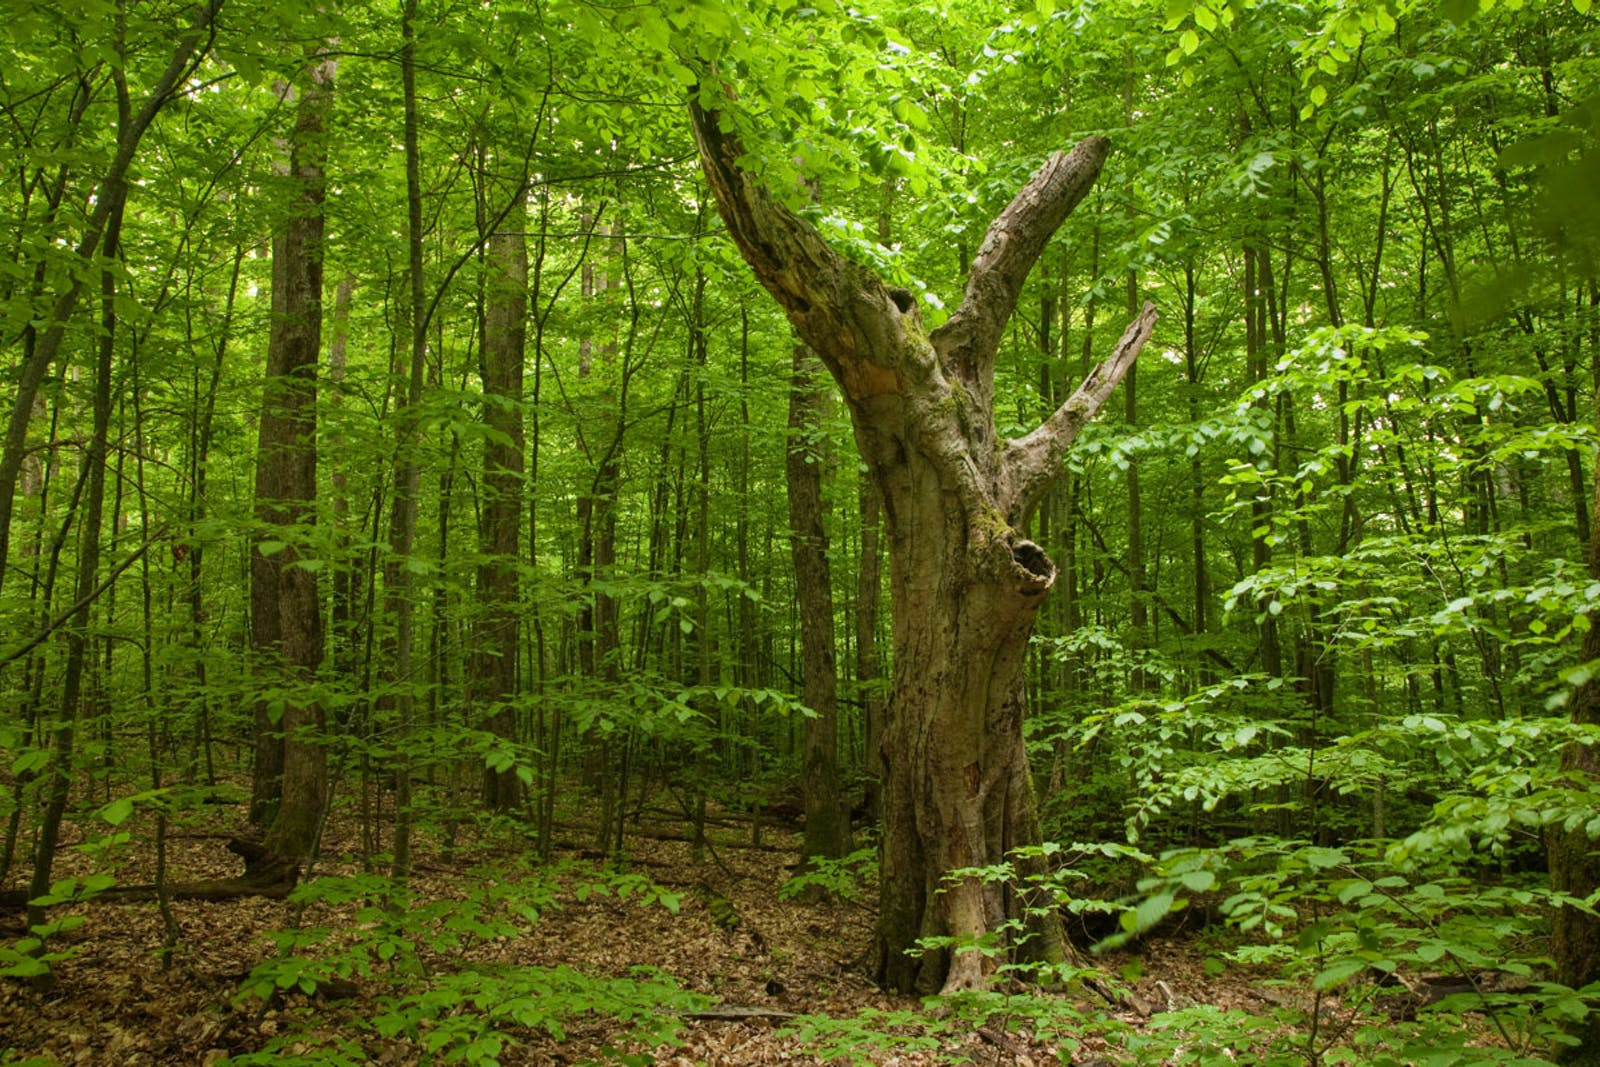 Euxine-Colchic Broadleaf Forests